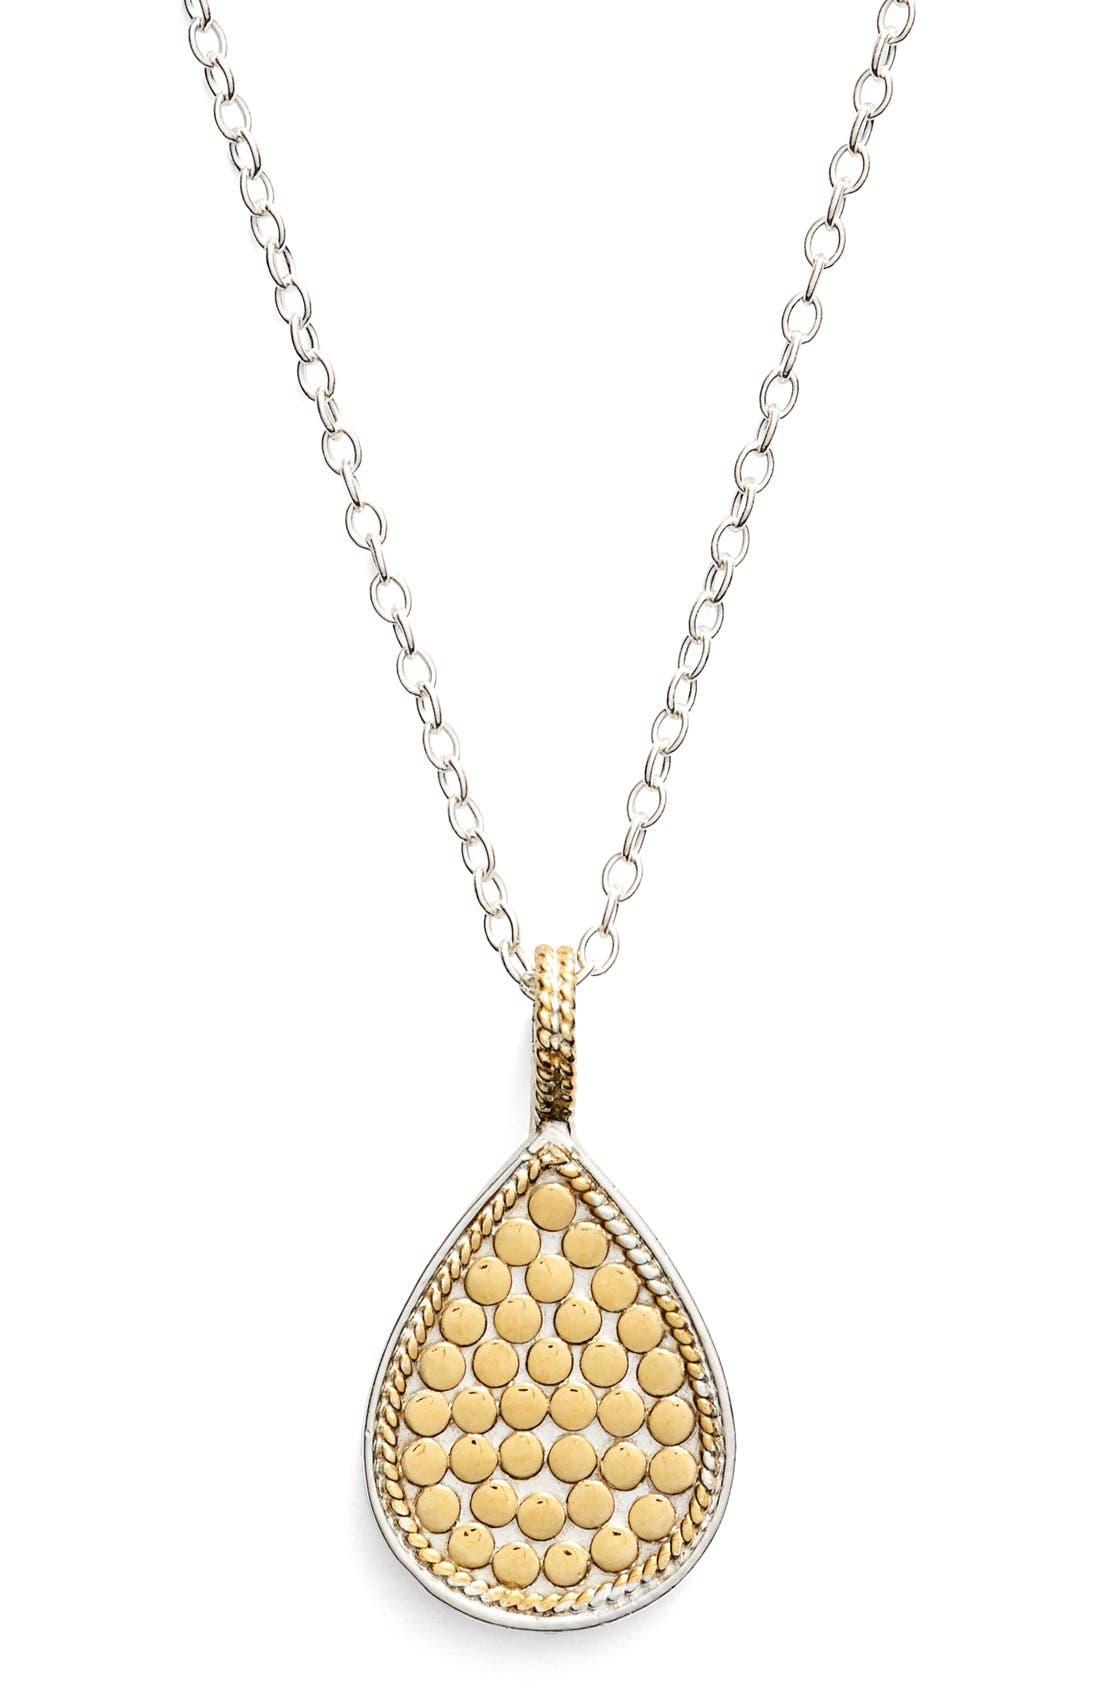 'Gili' Reversible Teardrop Pendant Necklace,                         Main,                         color, Gold/ Silver